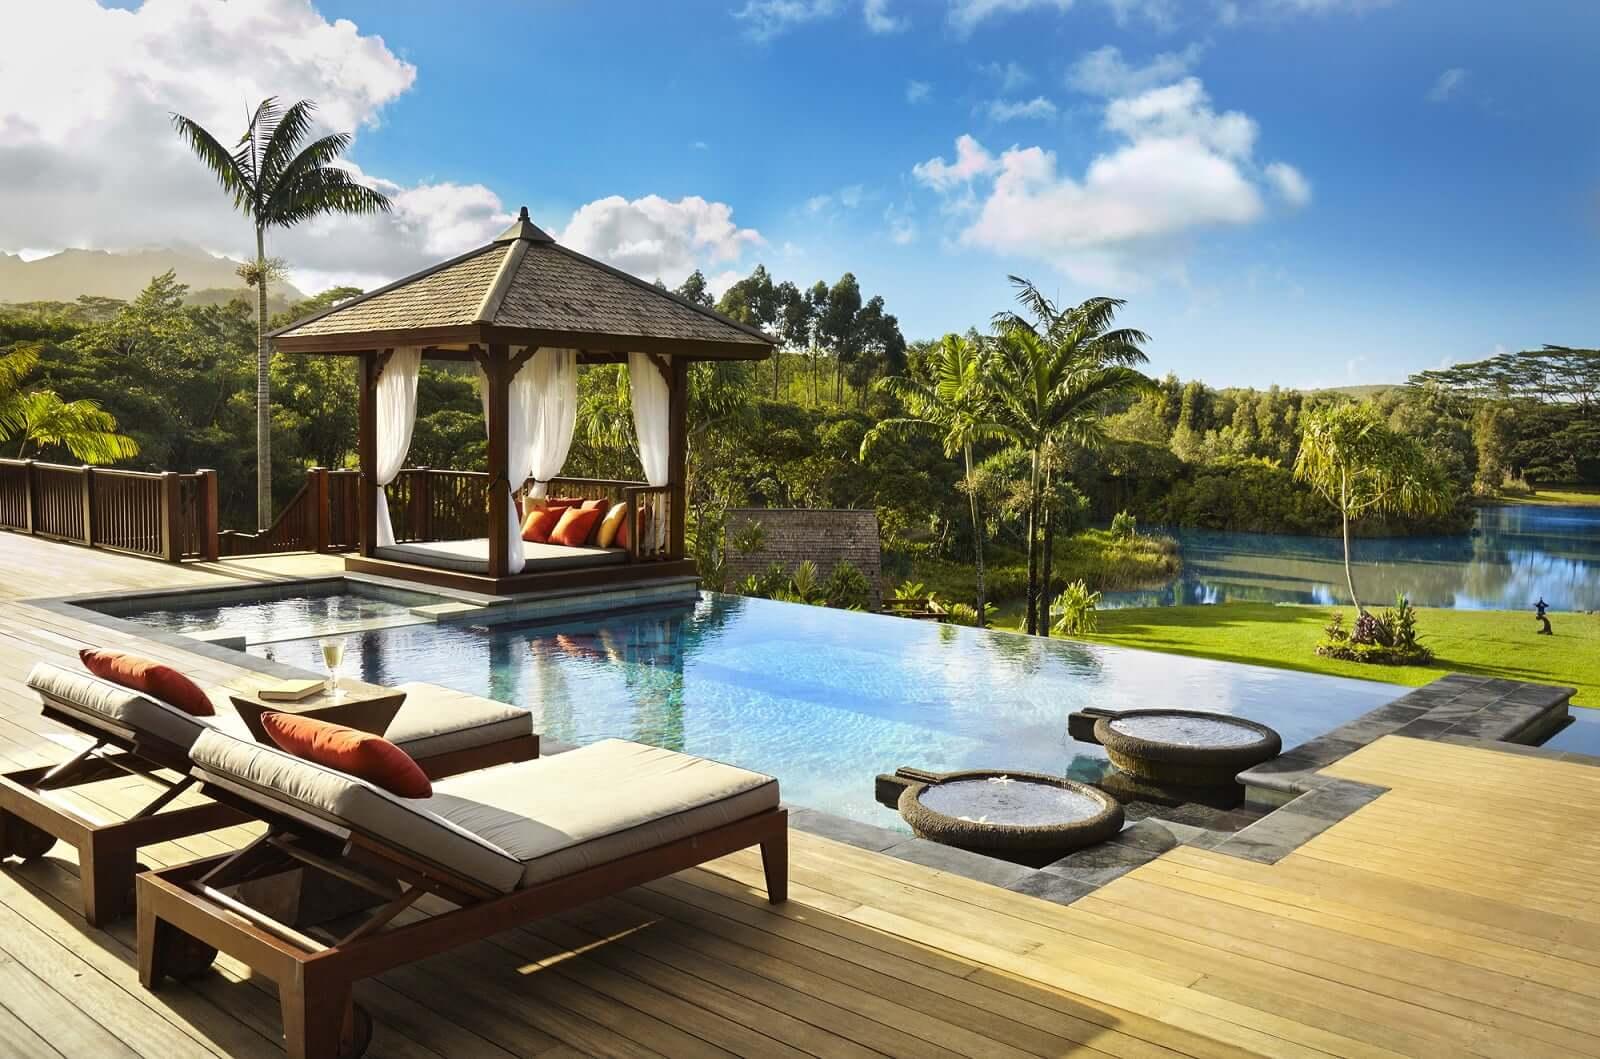 Bali Lani – Kauai, Hawaii